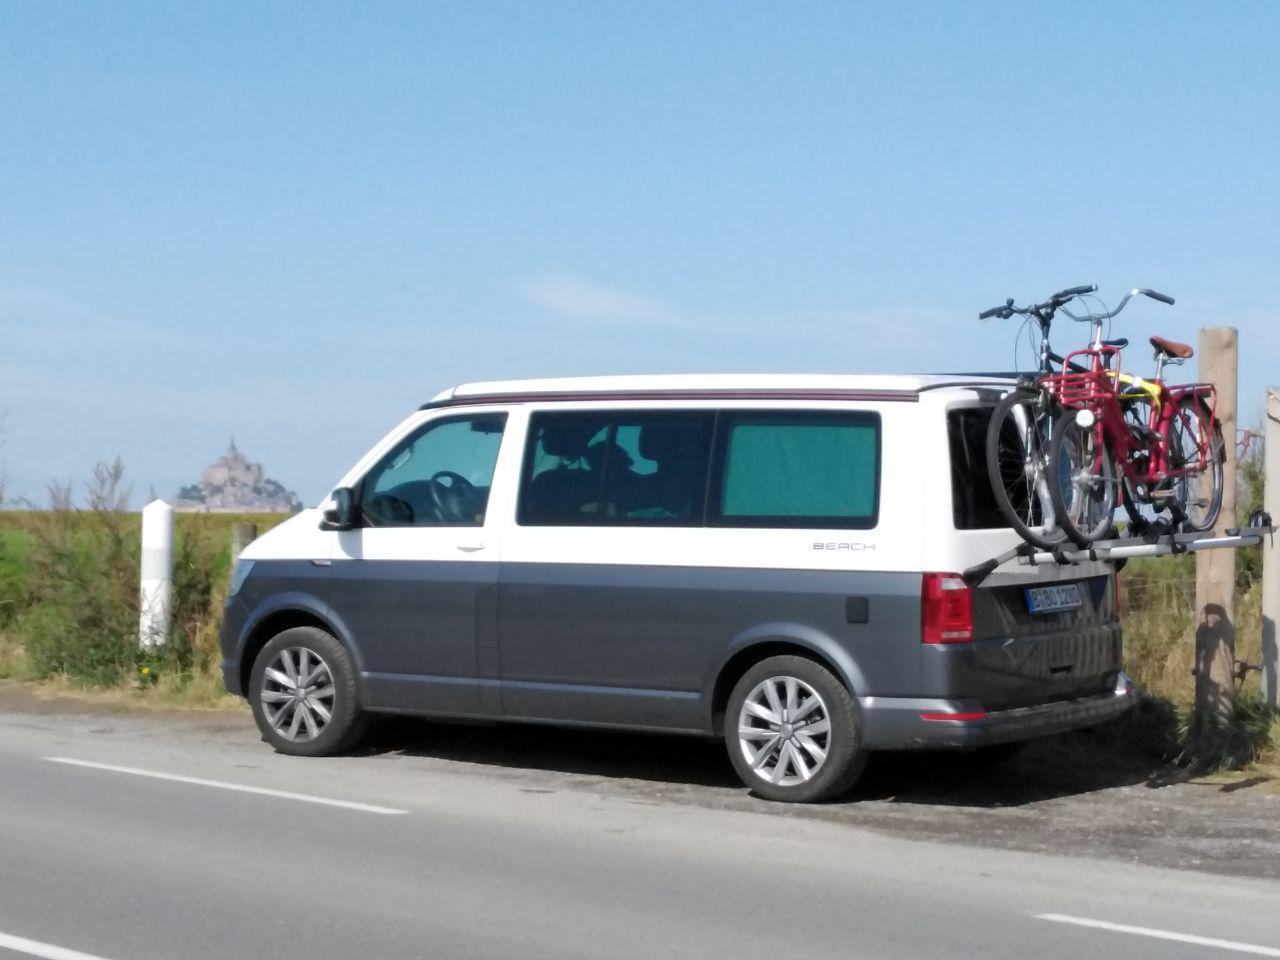 Unser Praxisauto – Der VW Campingbus